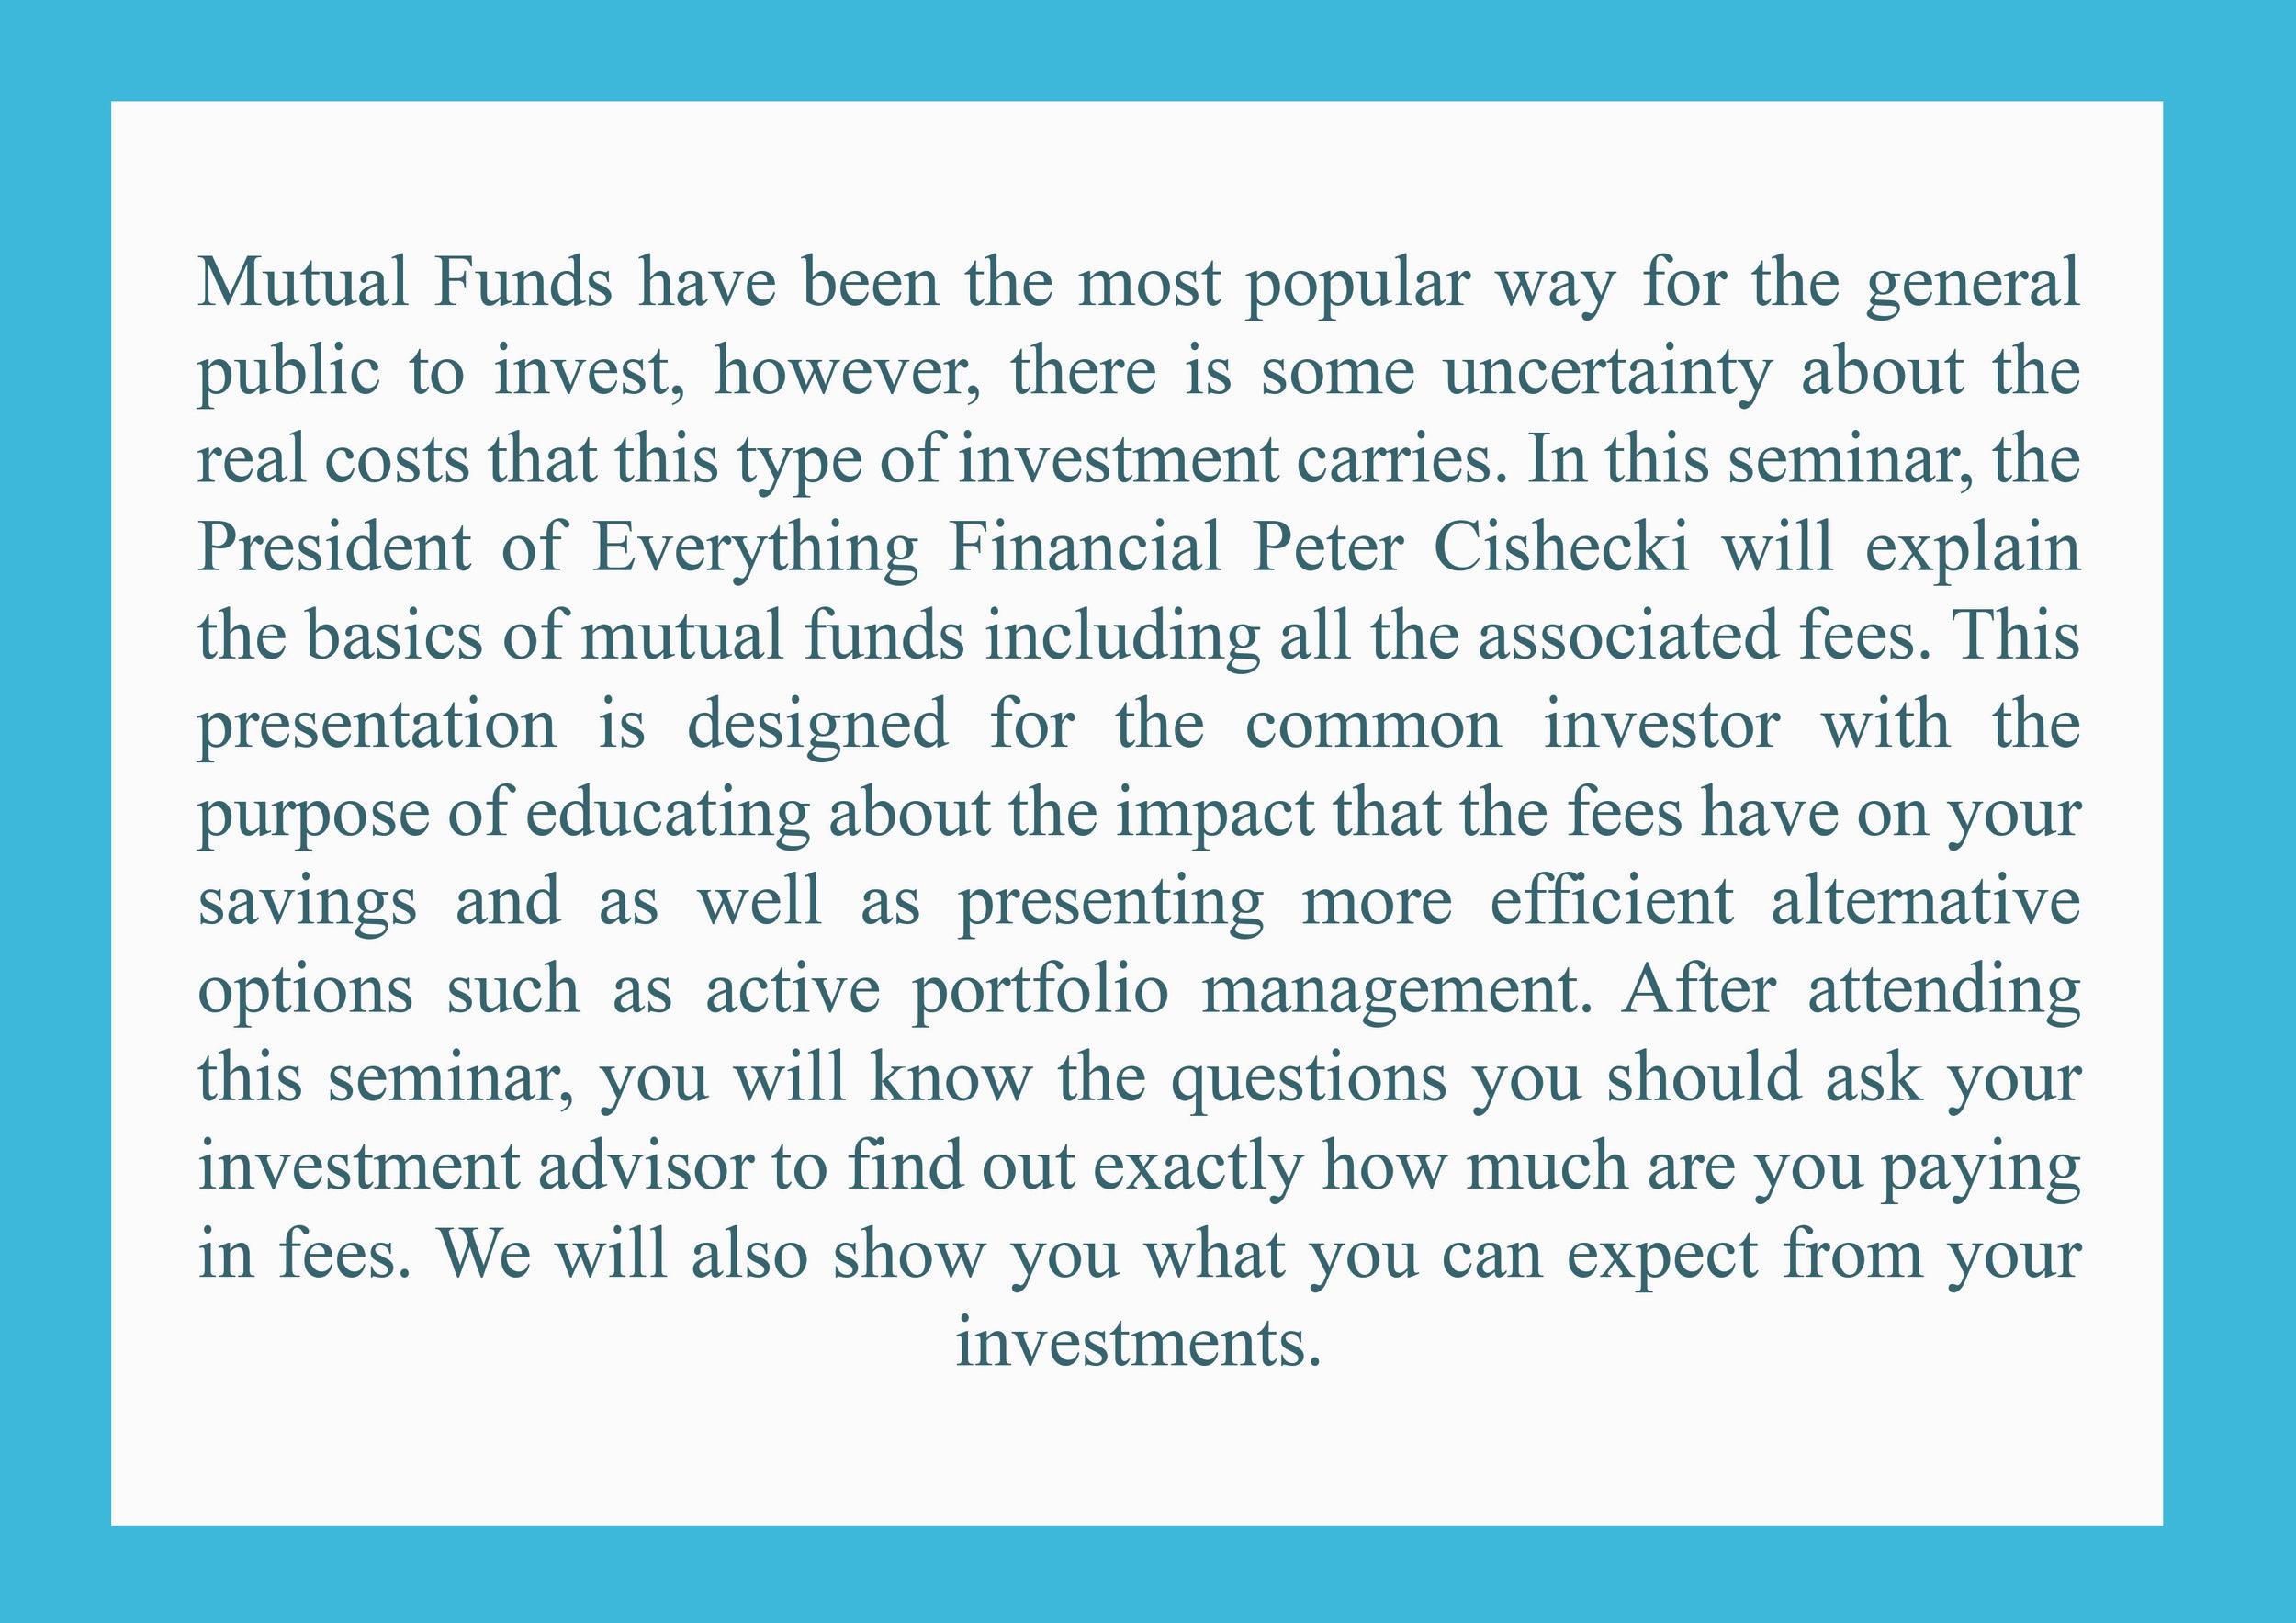 Mutual funds description.jpg